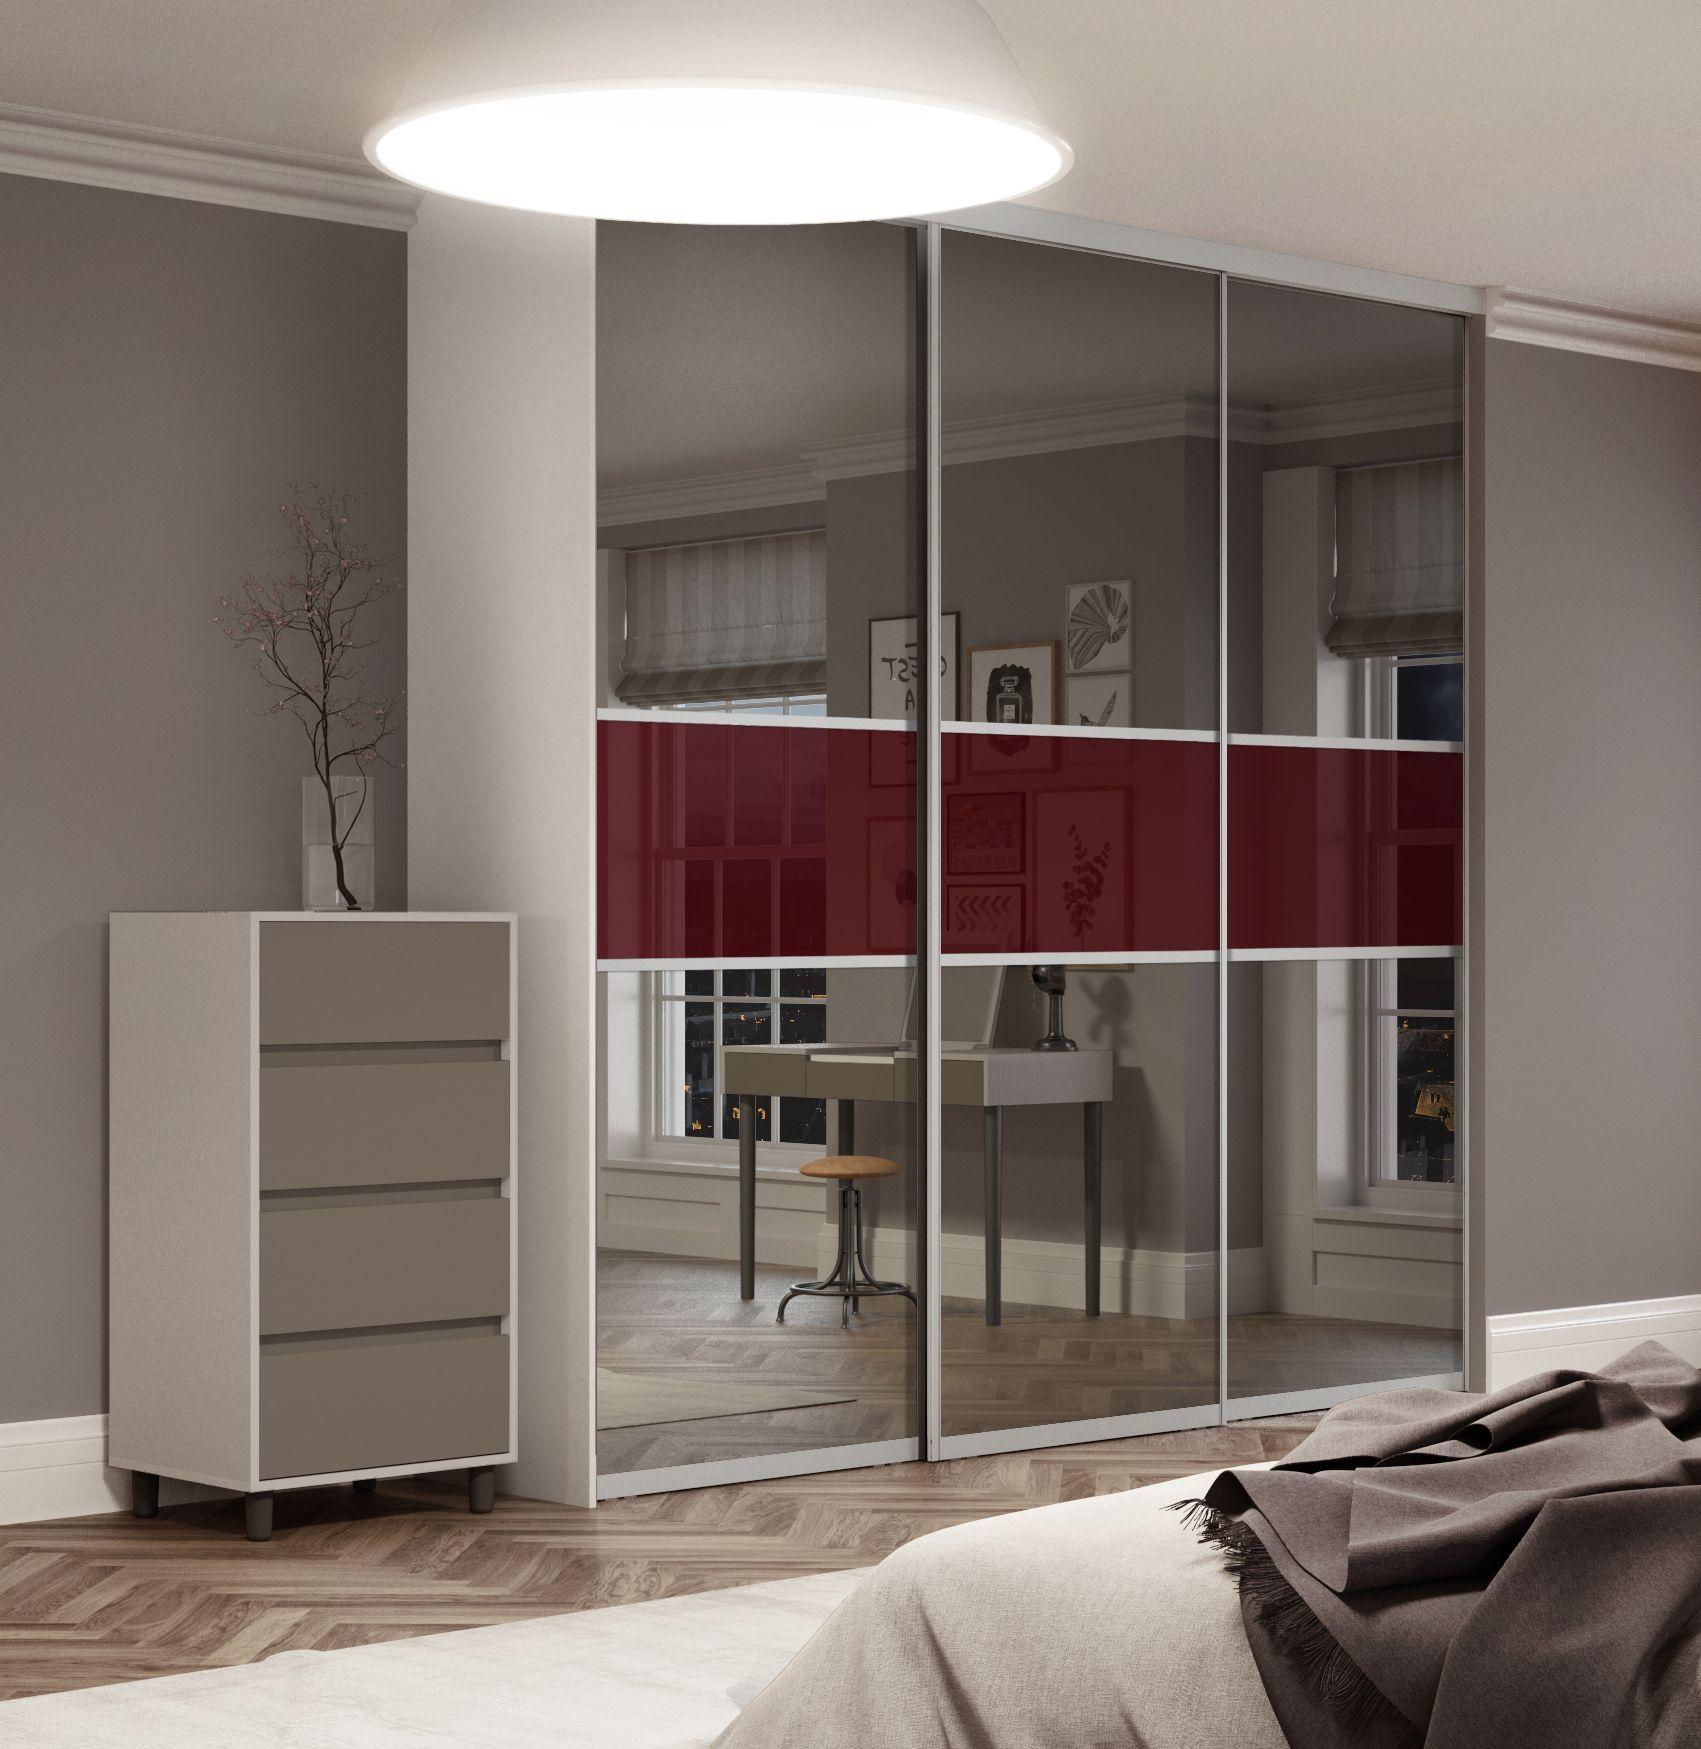 3 panel mirrored sliding closet doors - Premium Midi Fineline Sliding Wardrobe Doors In Mirror And Maroon Glass With Satin Silver Frame